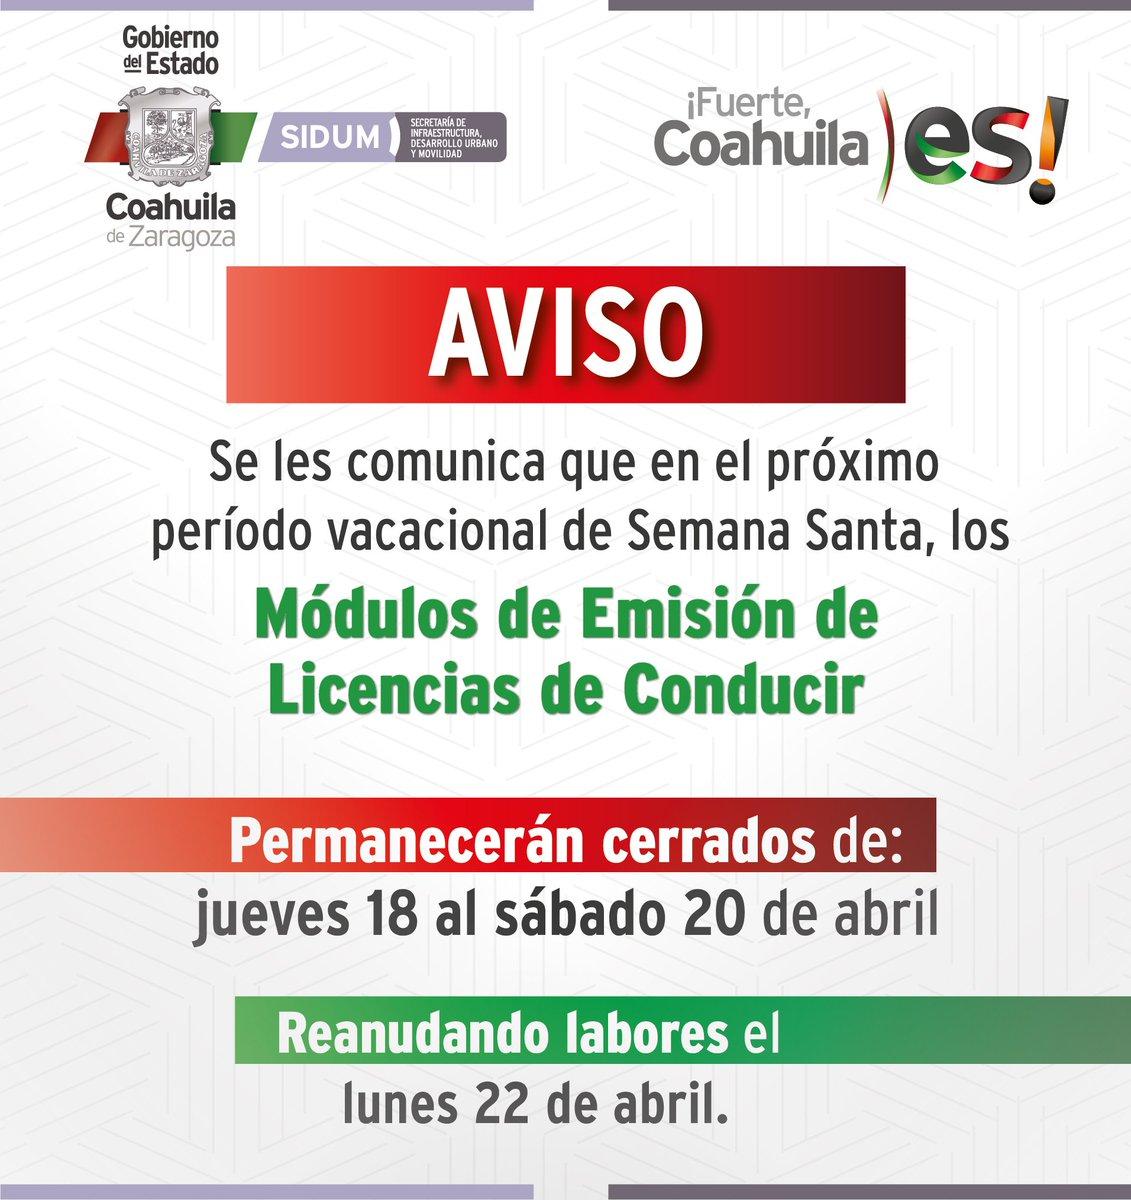 Administración Fiscal De Coahuila On Twitter Aviso La